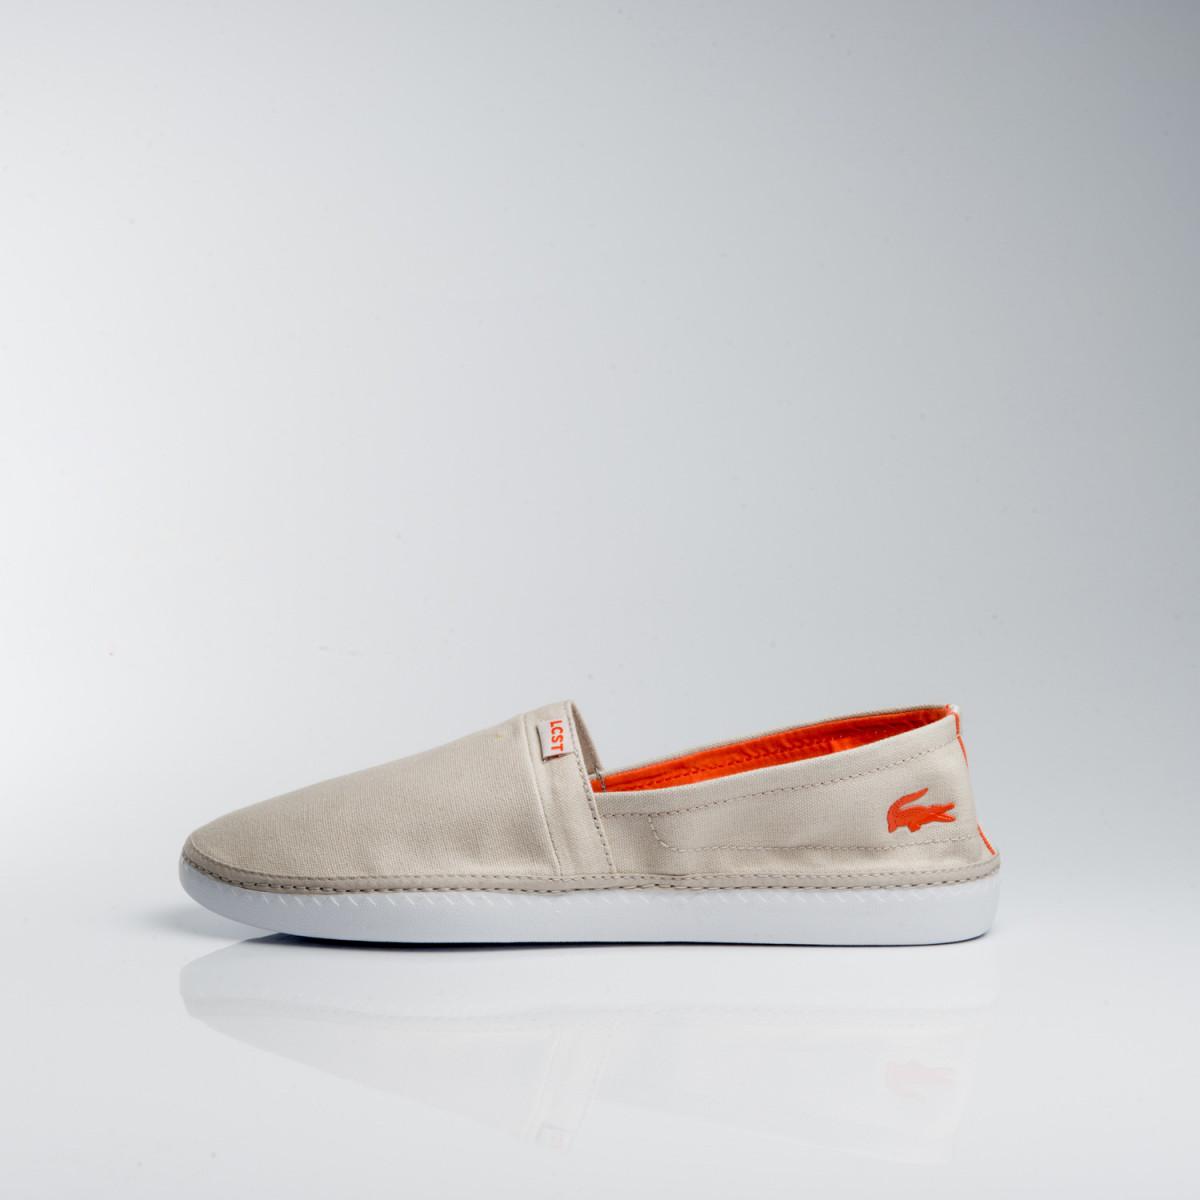 Zapatillas Lacoste Sundaze Deck